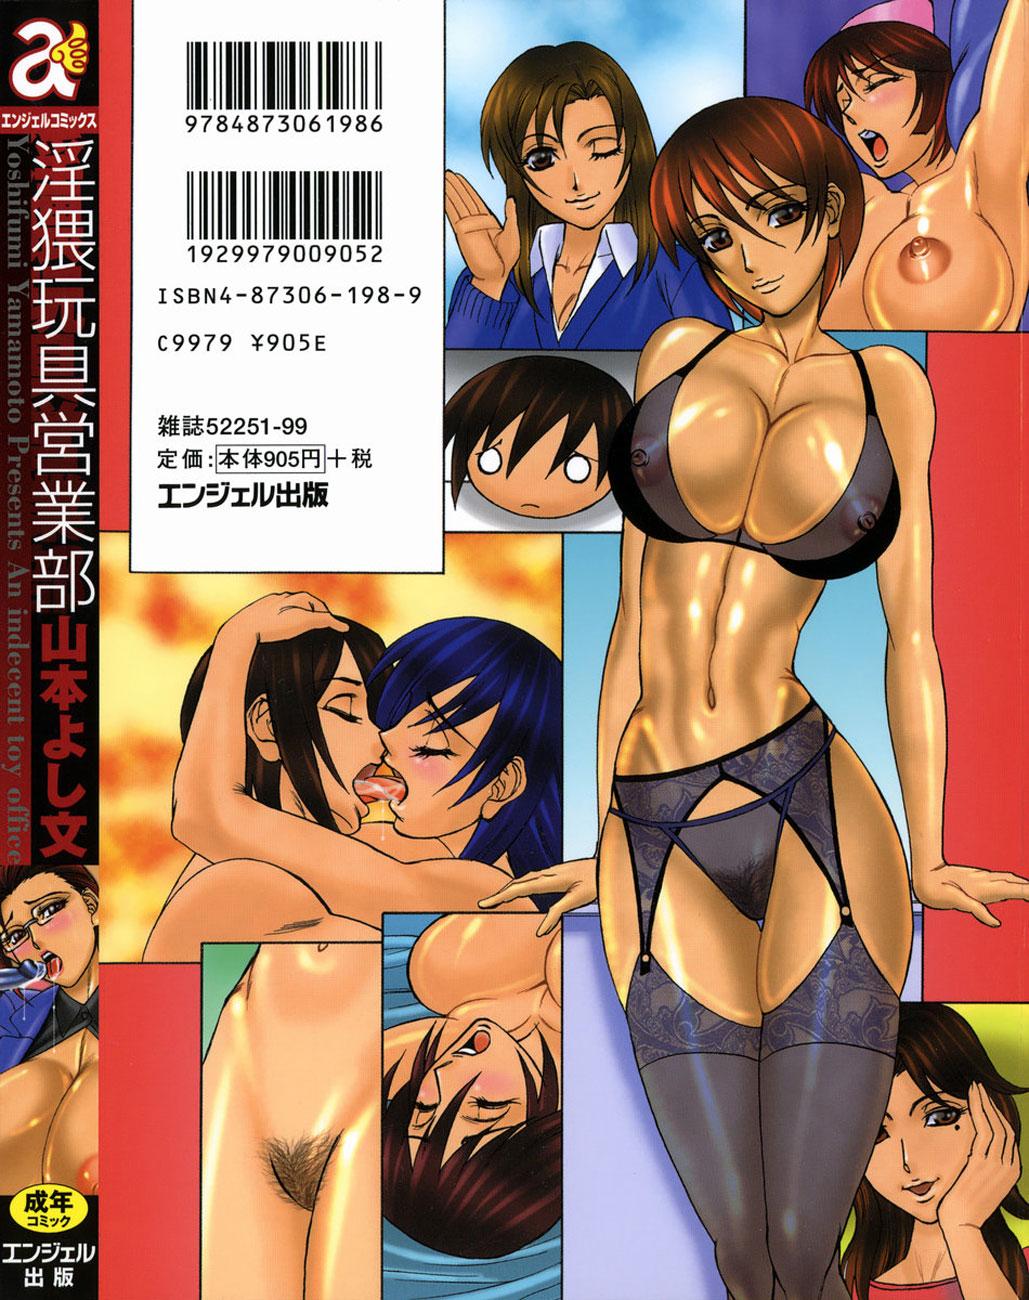 Anime hentai top sales